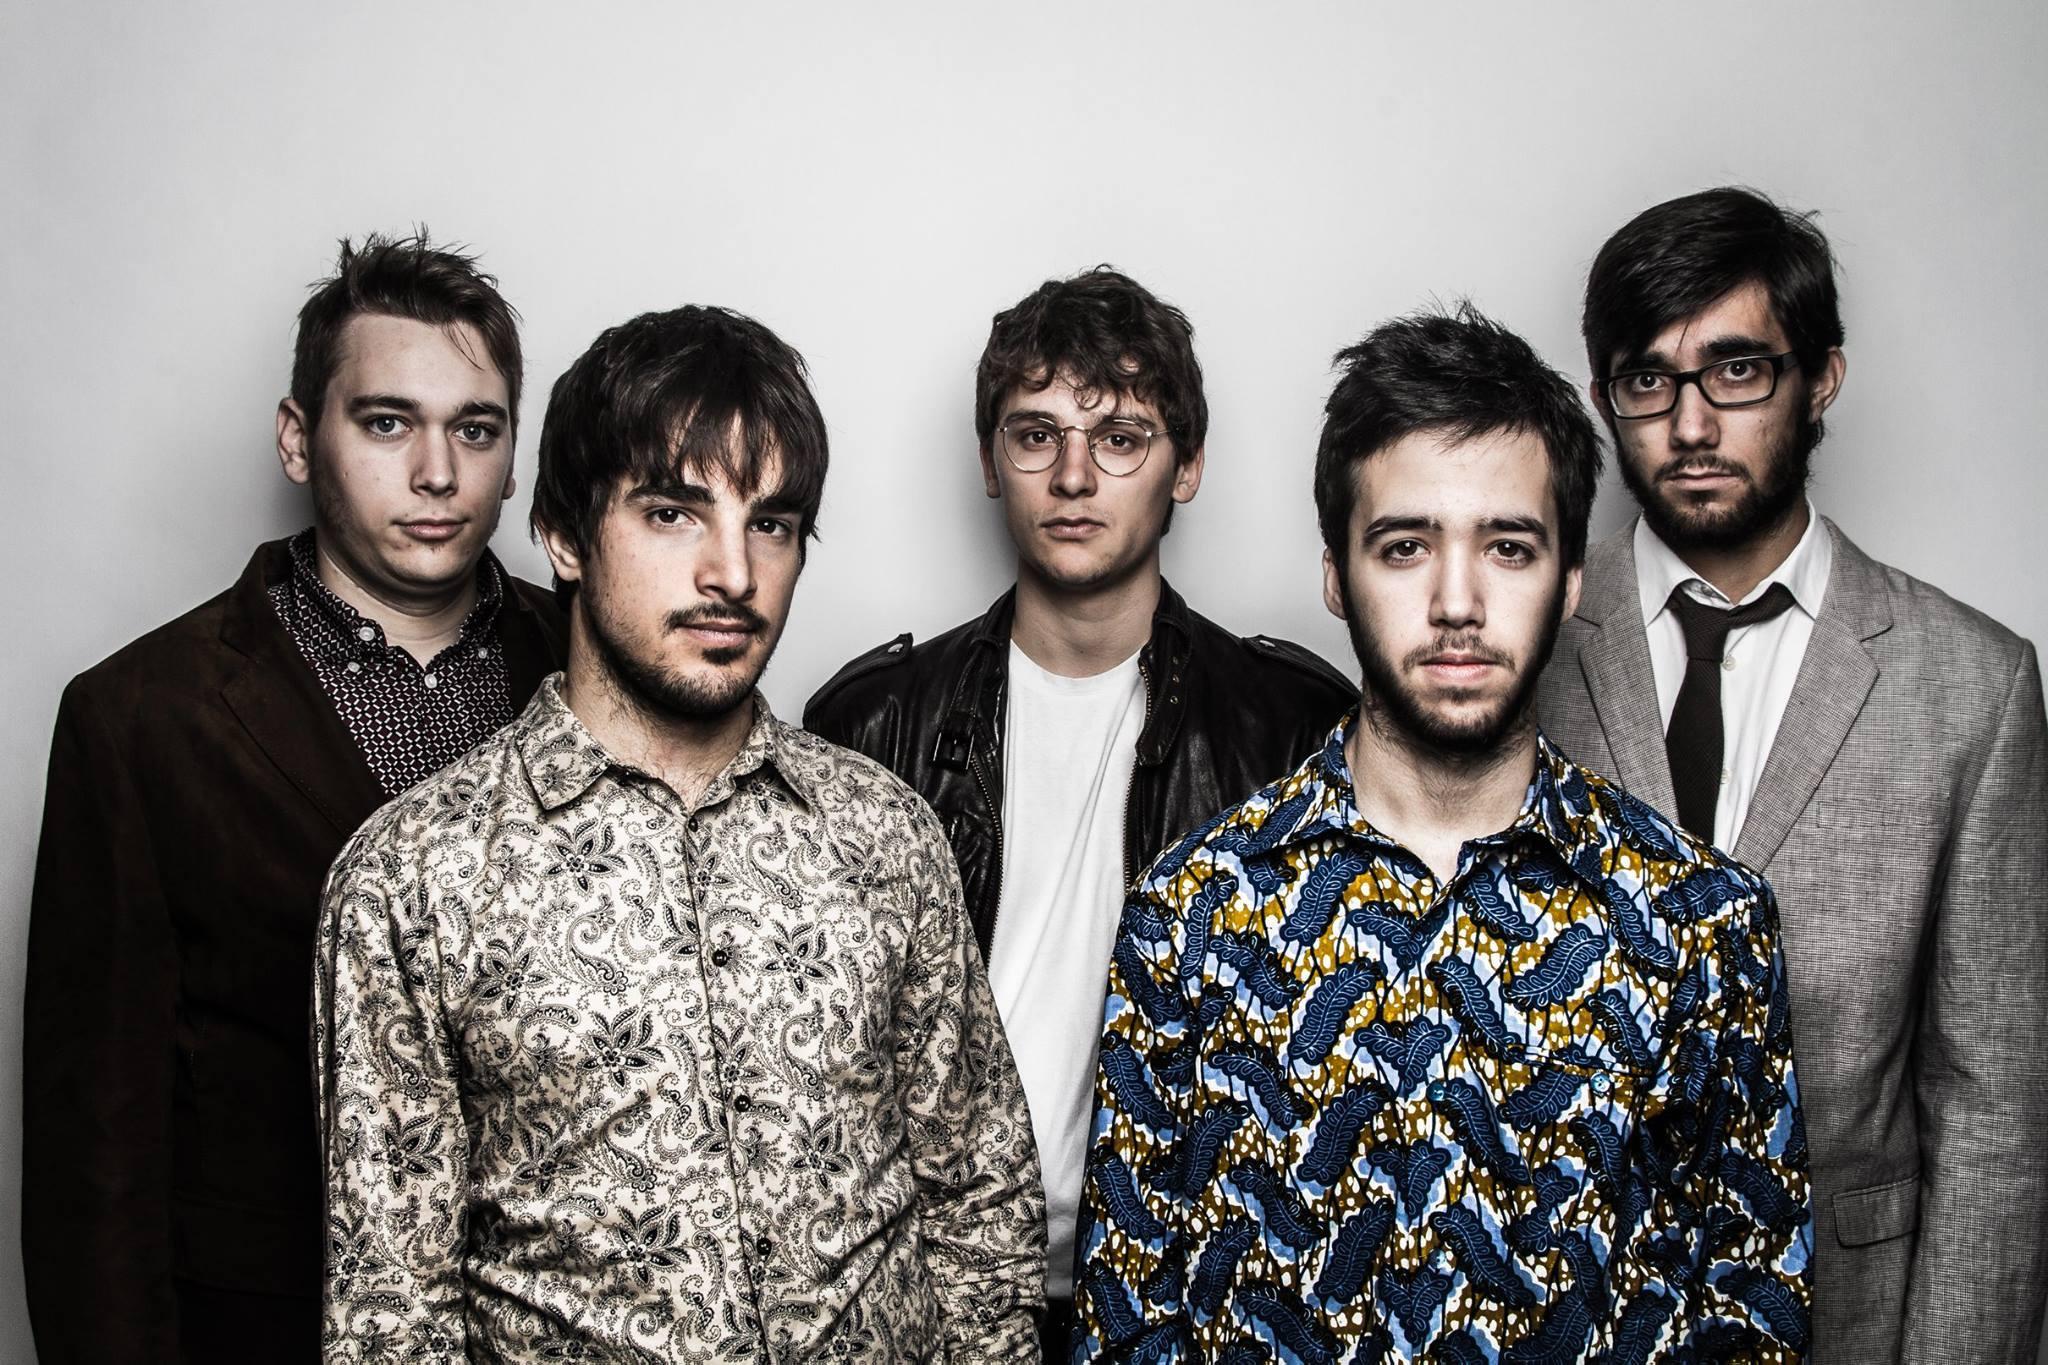 Primavera als Barris: The Free Fall Band + Rombo + Snooze